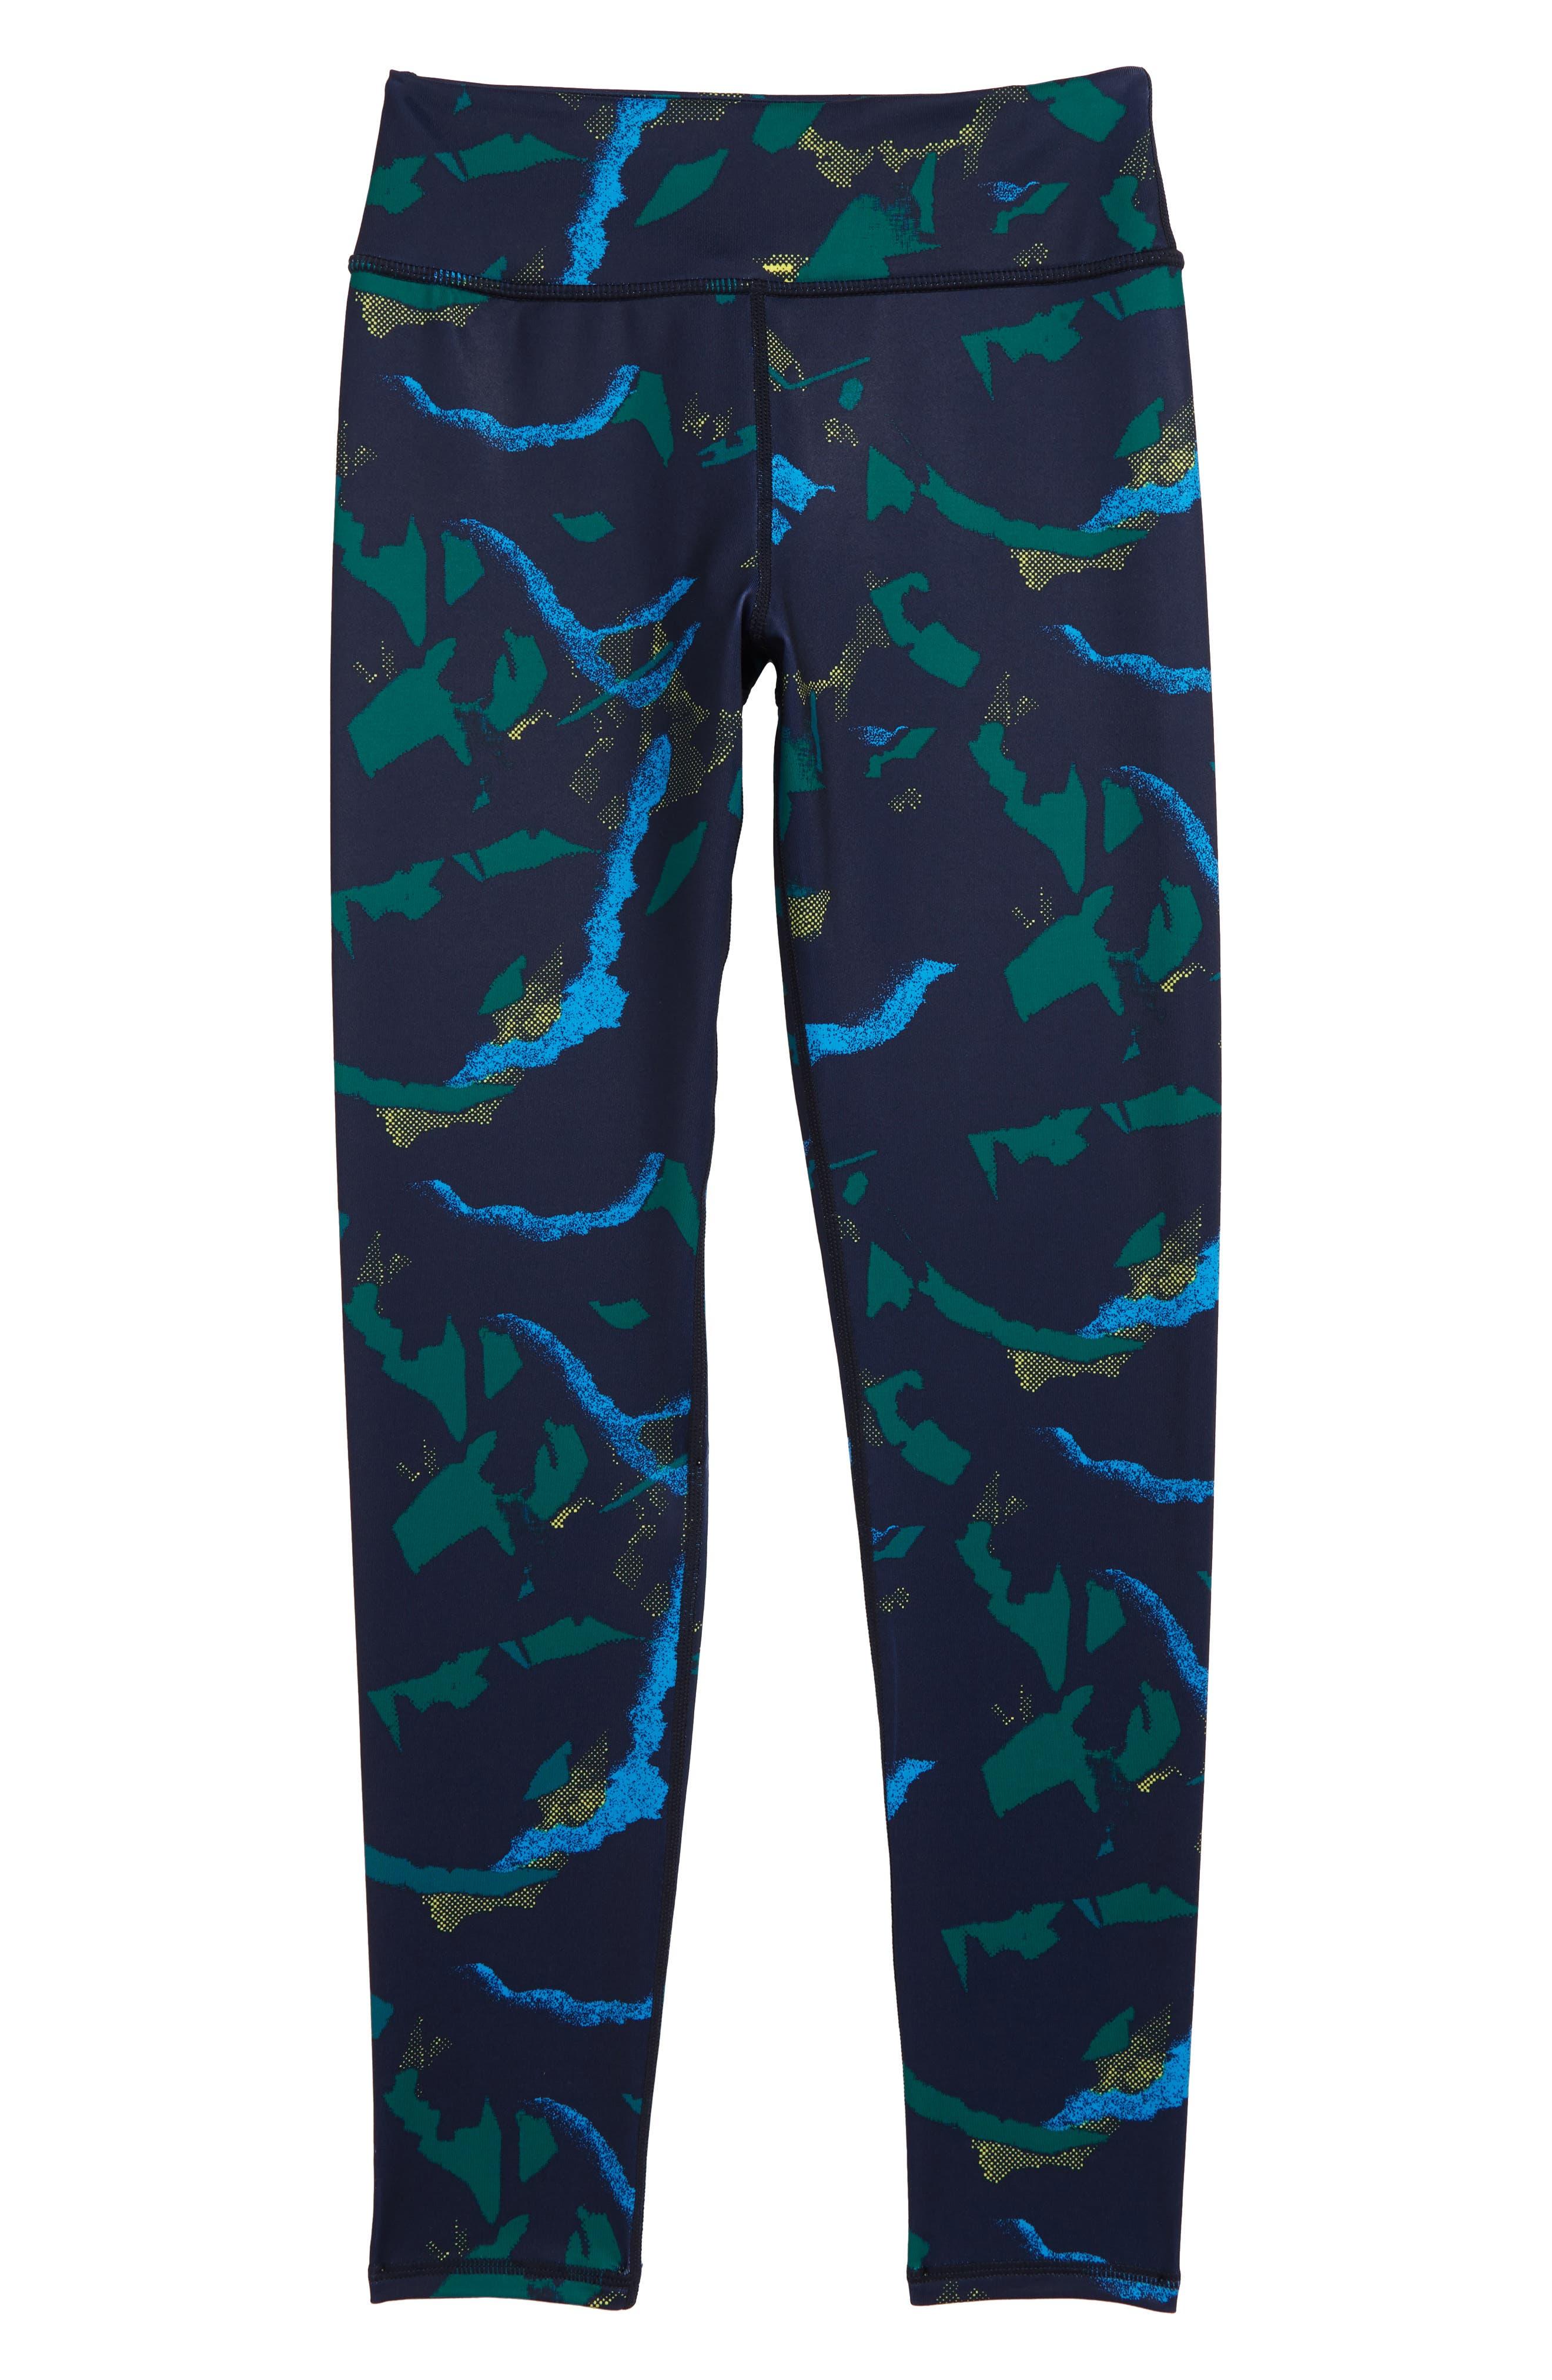 Print High Waist Leggings,                         Main,                         color, NAVY MARITIME ABSTRACT POP